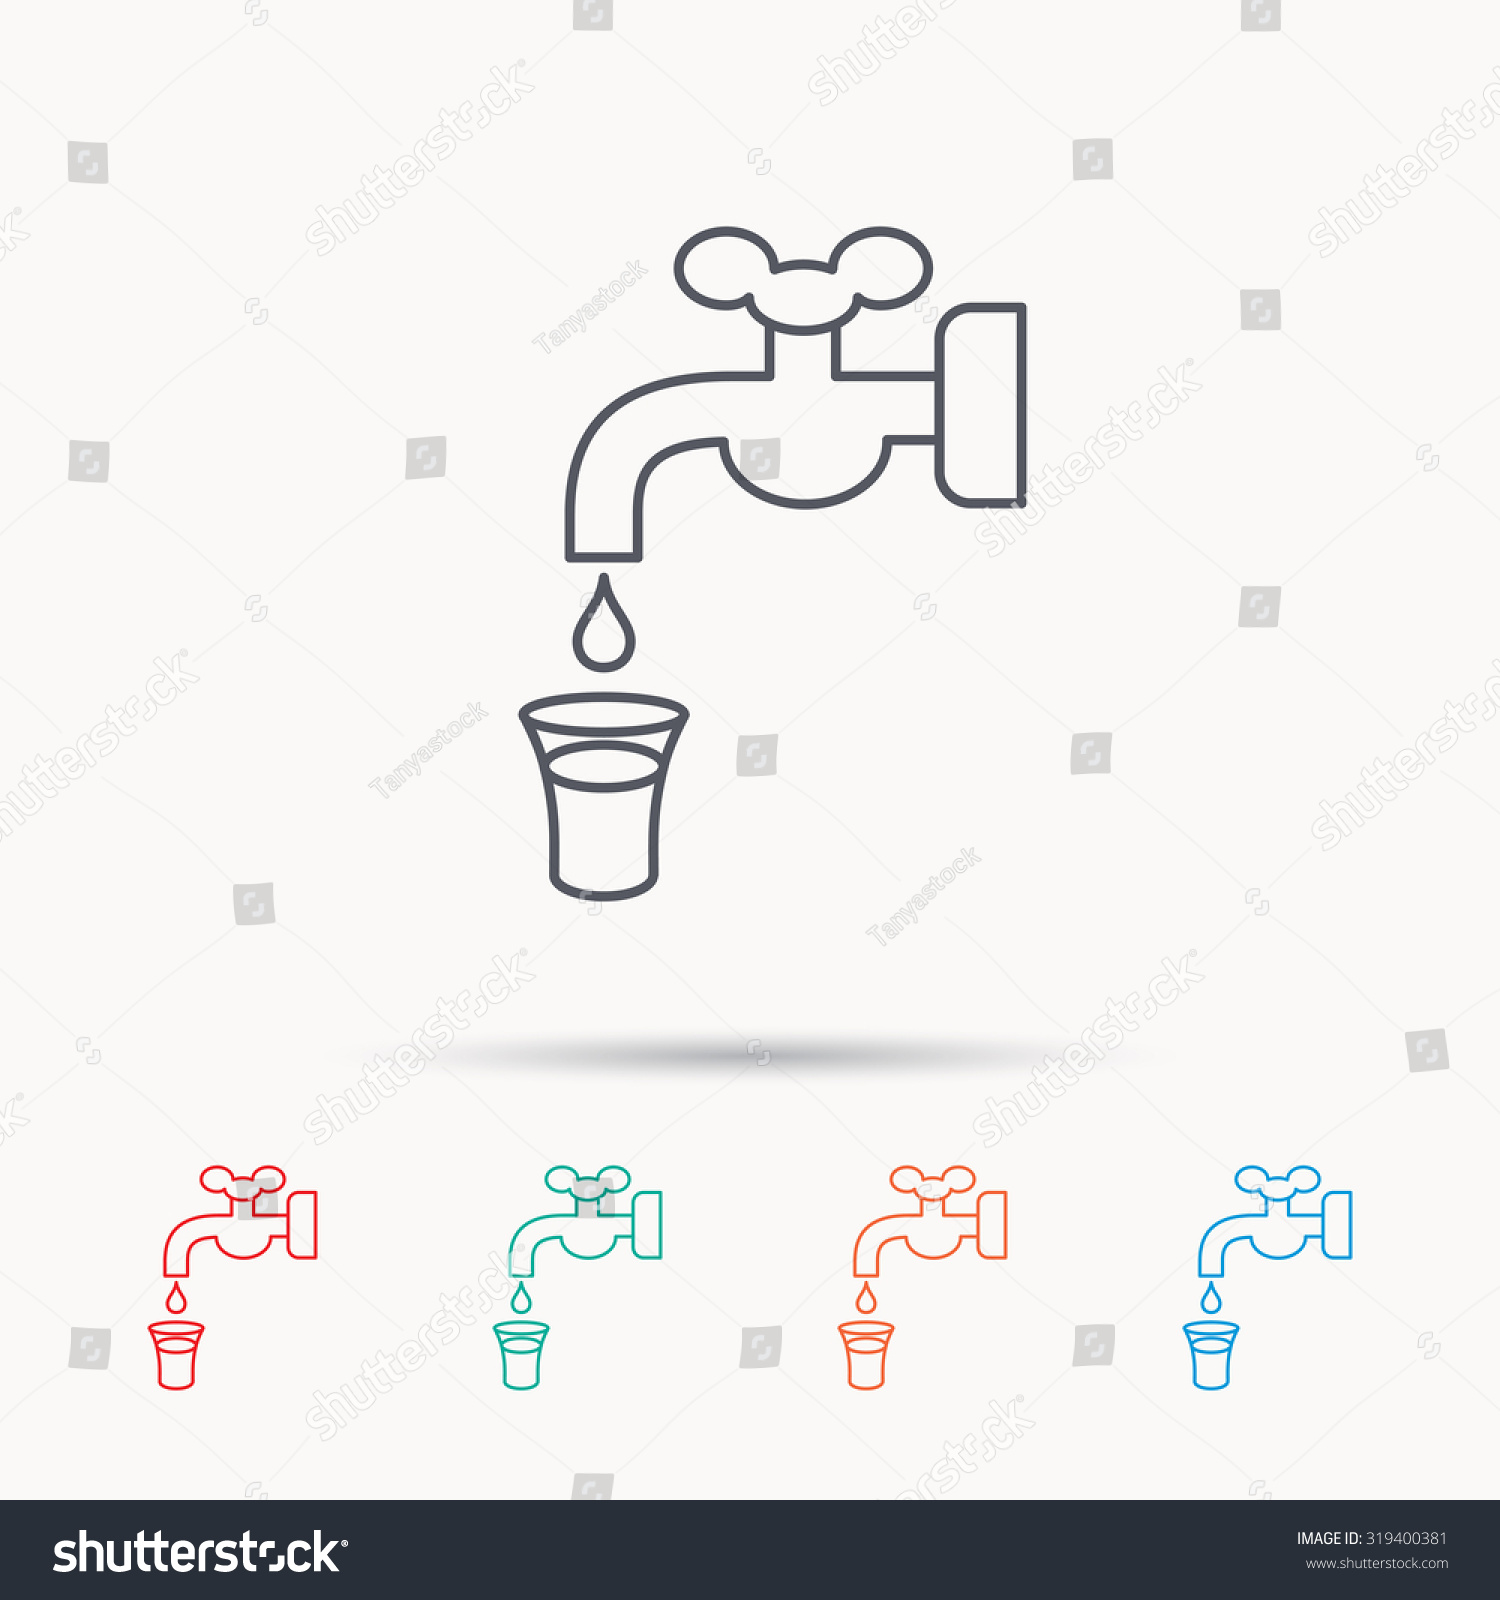 Save Water Icon Crane Faucet Drop Stock Vector 319400381 - Shutterstock